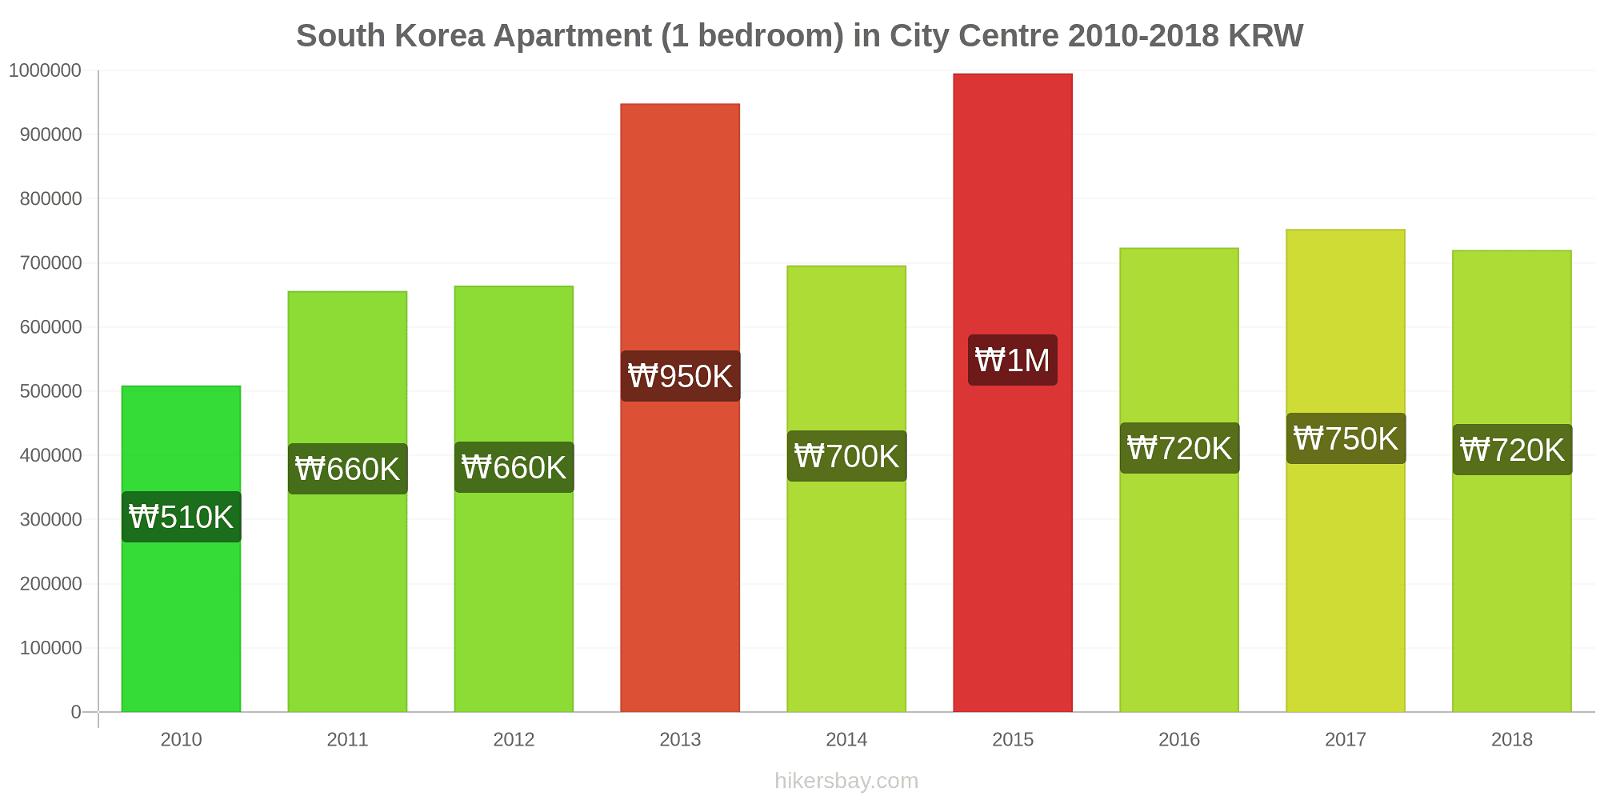 South Korea price changes Apartment (1 bedroom) in City Centre hikersbay.com